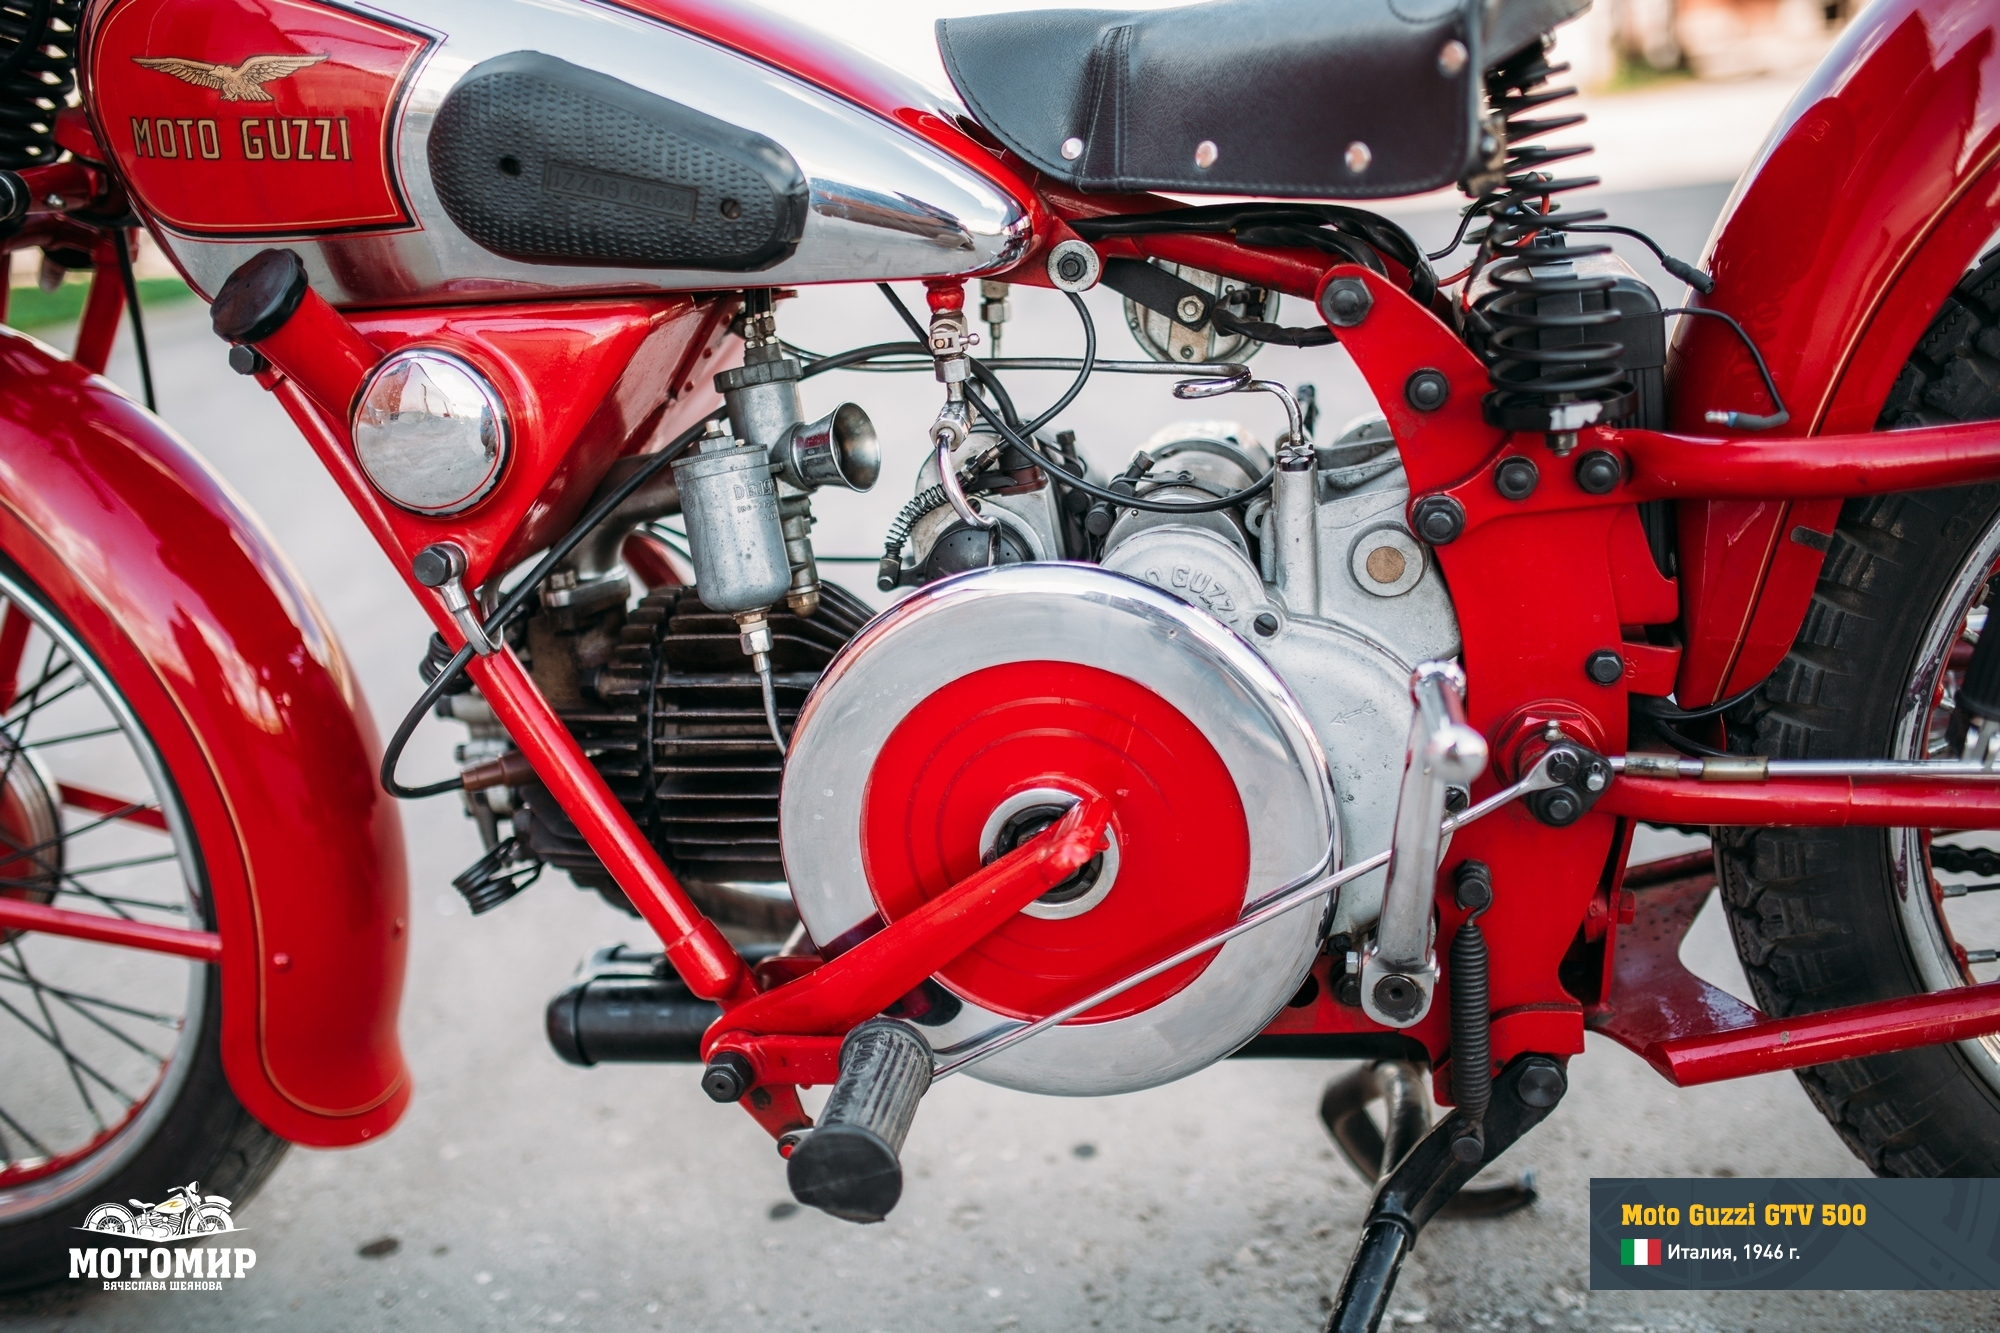 moto-guzzi-gtv-500-201509-web-26